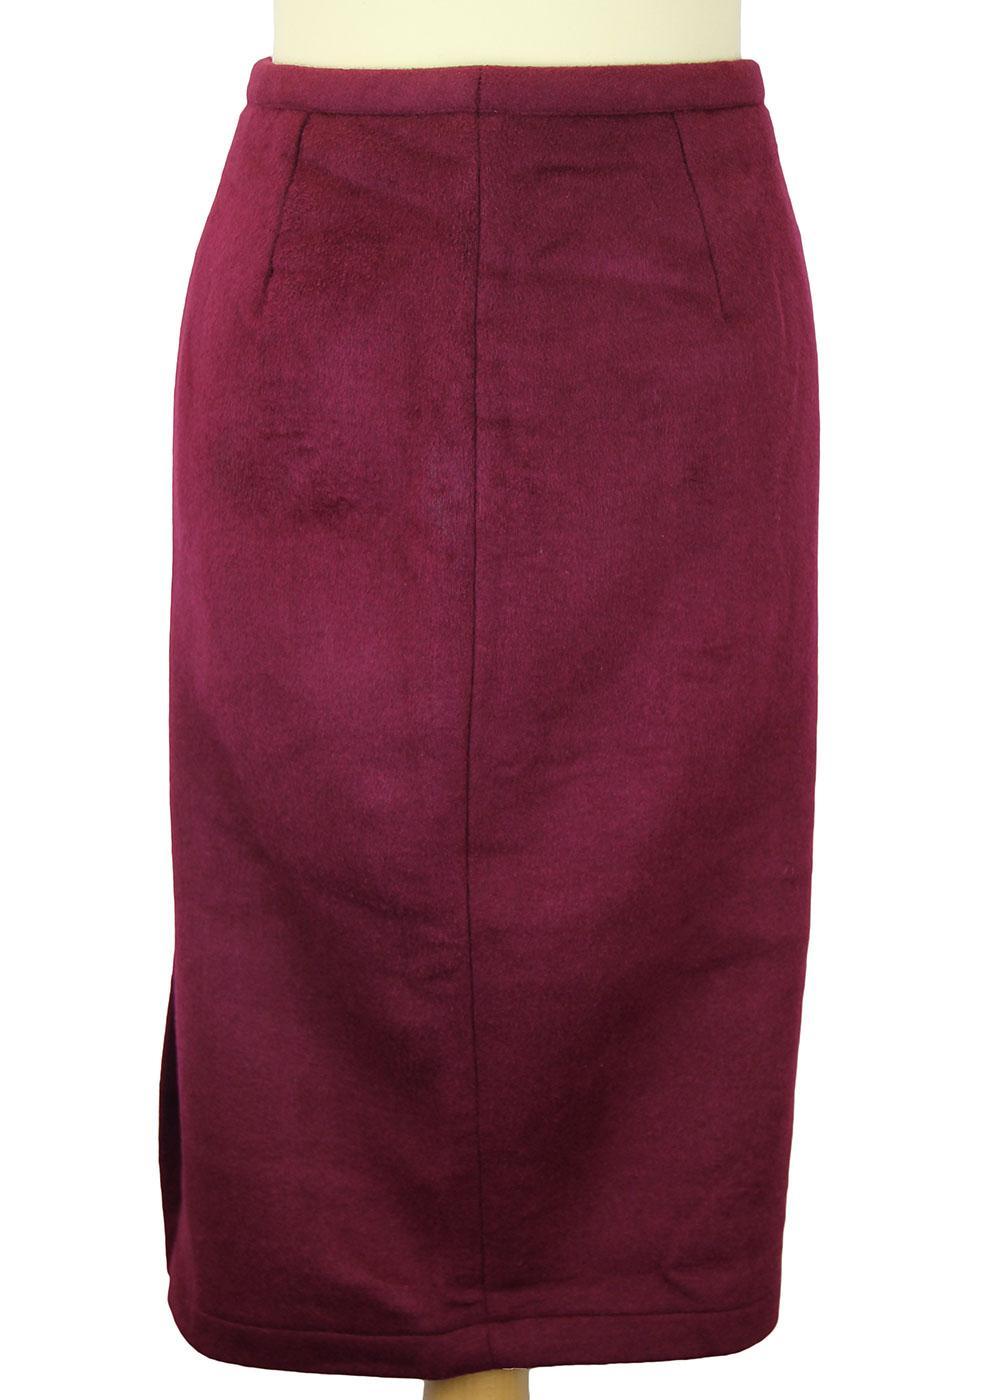 Divine Wine TATYANA Retro 50s Vintage Pencil Skirt